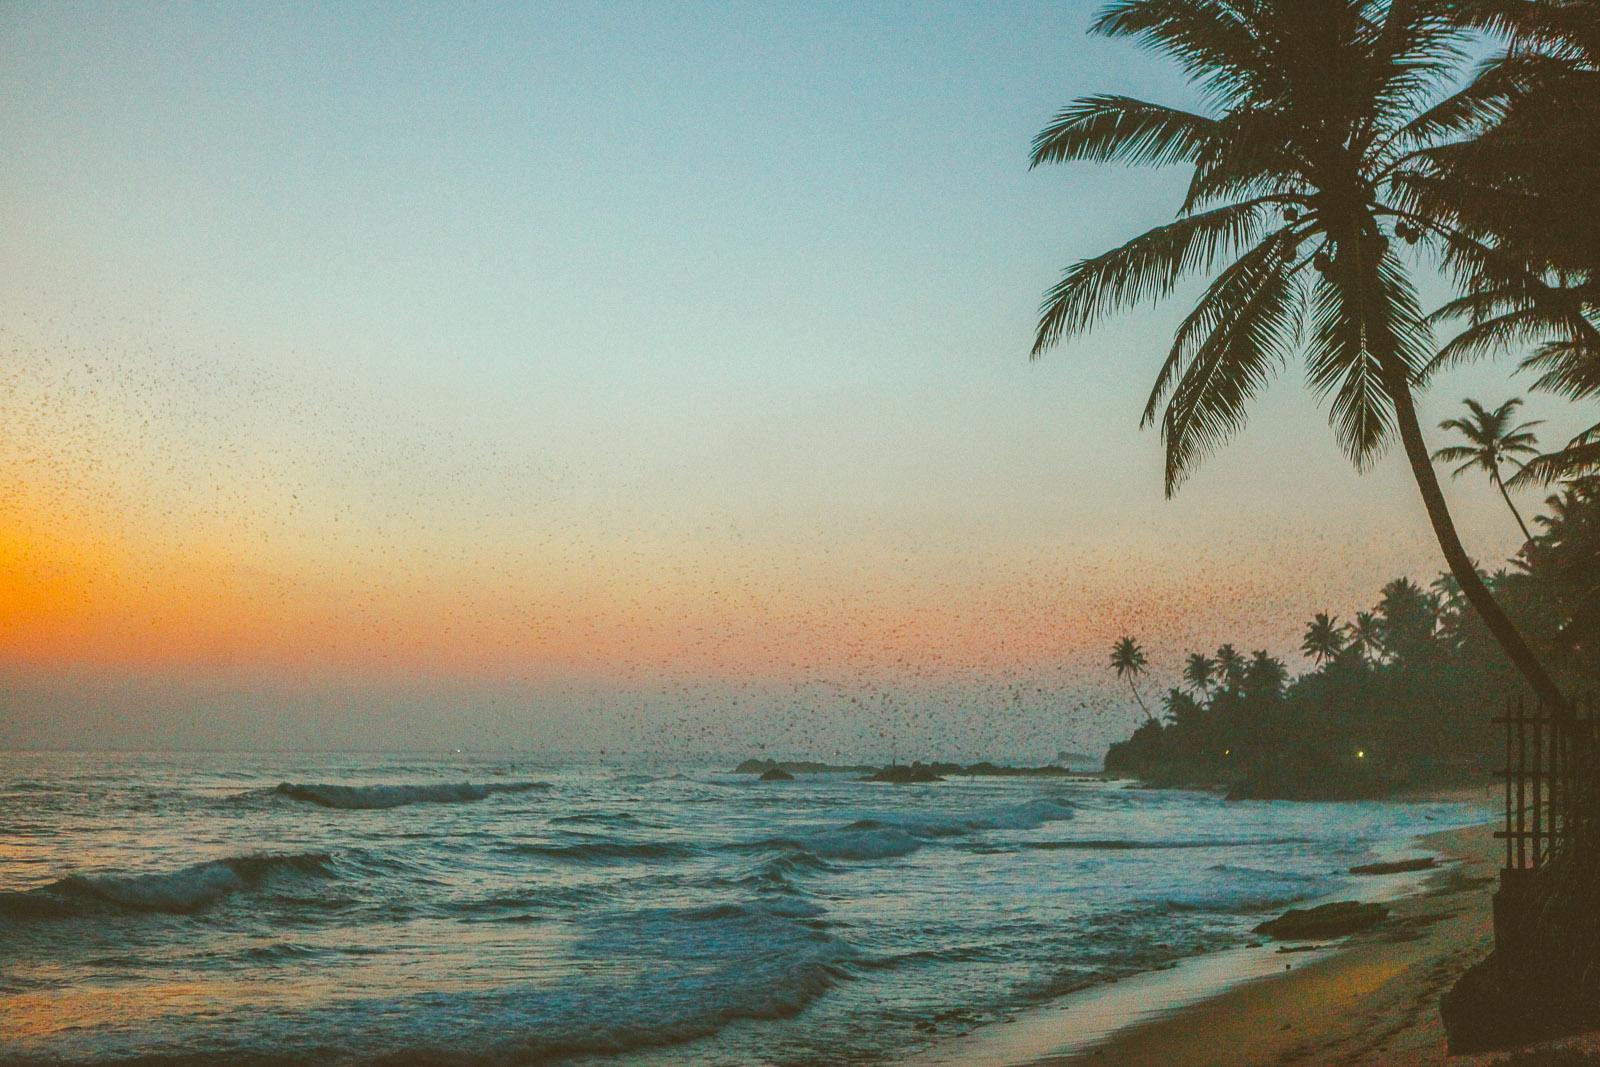 Sri Lanka-Hikkaduwa-Midigama-thalpe-era-beach-jetwing-surf-travel-blog-IMG_8849